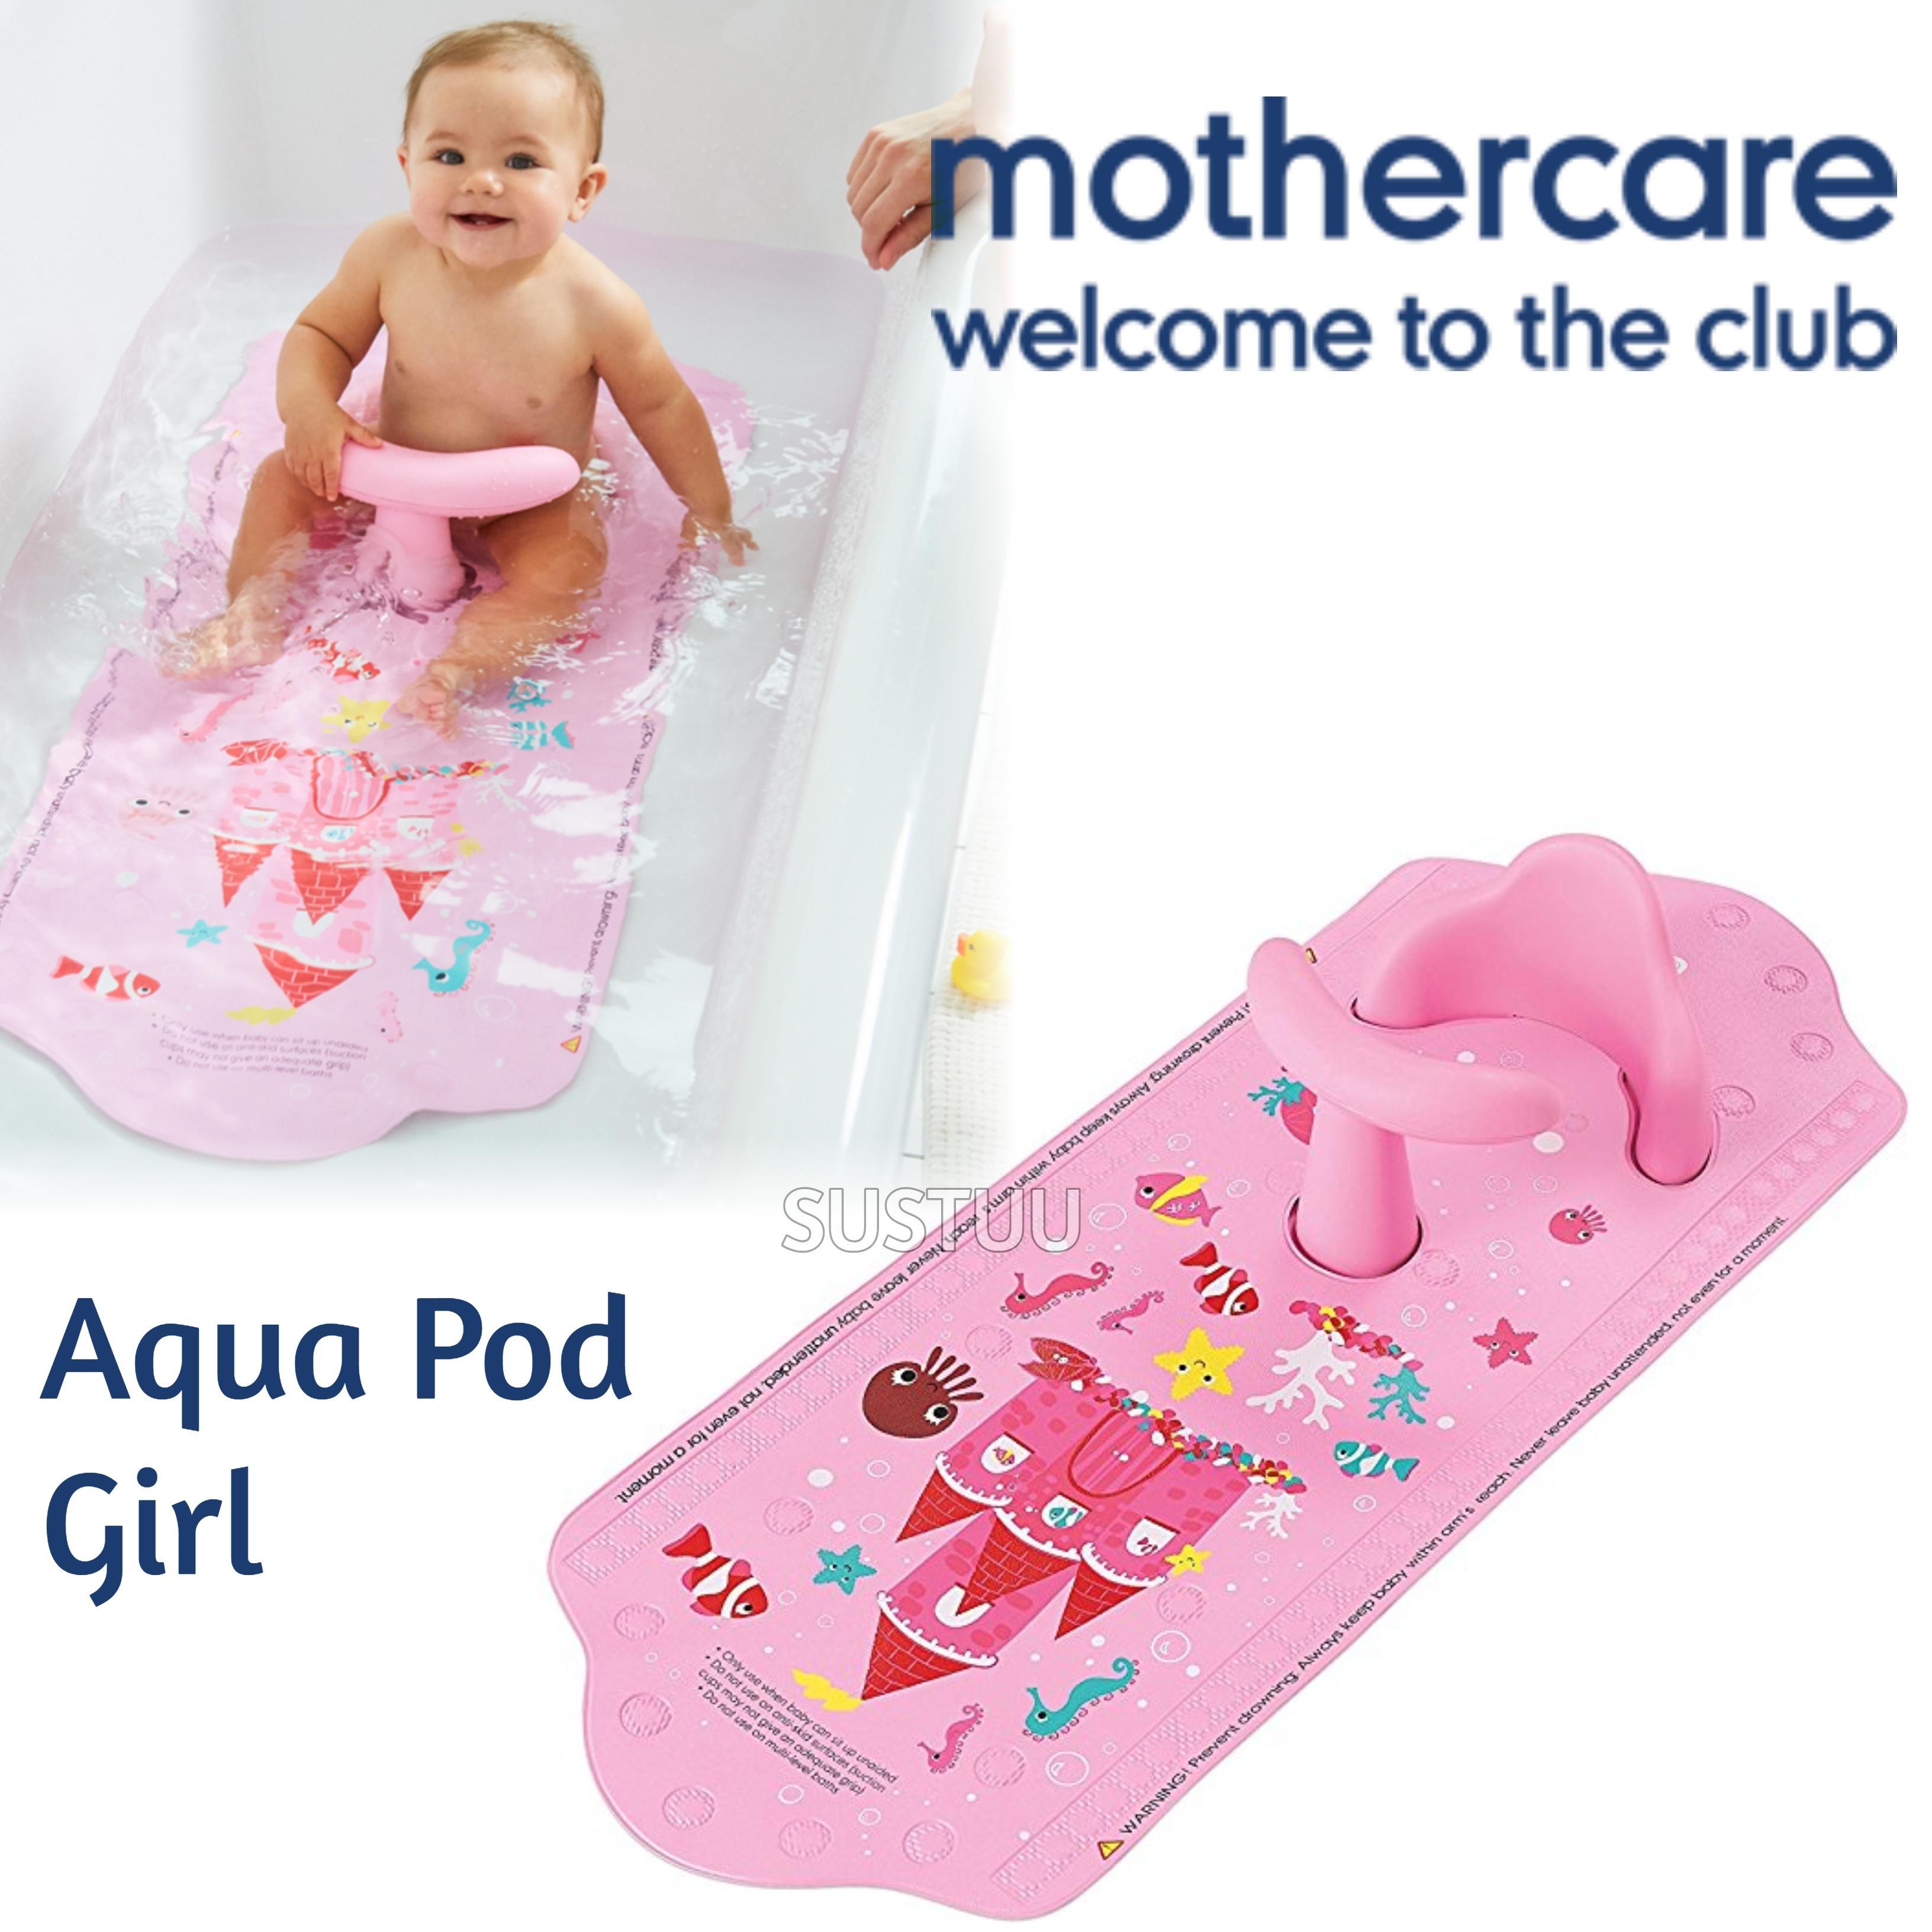 baby bath chair mothercare argos directors covers pod aqua seat safe spot support kid s hot uspqwf